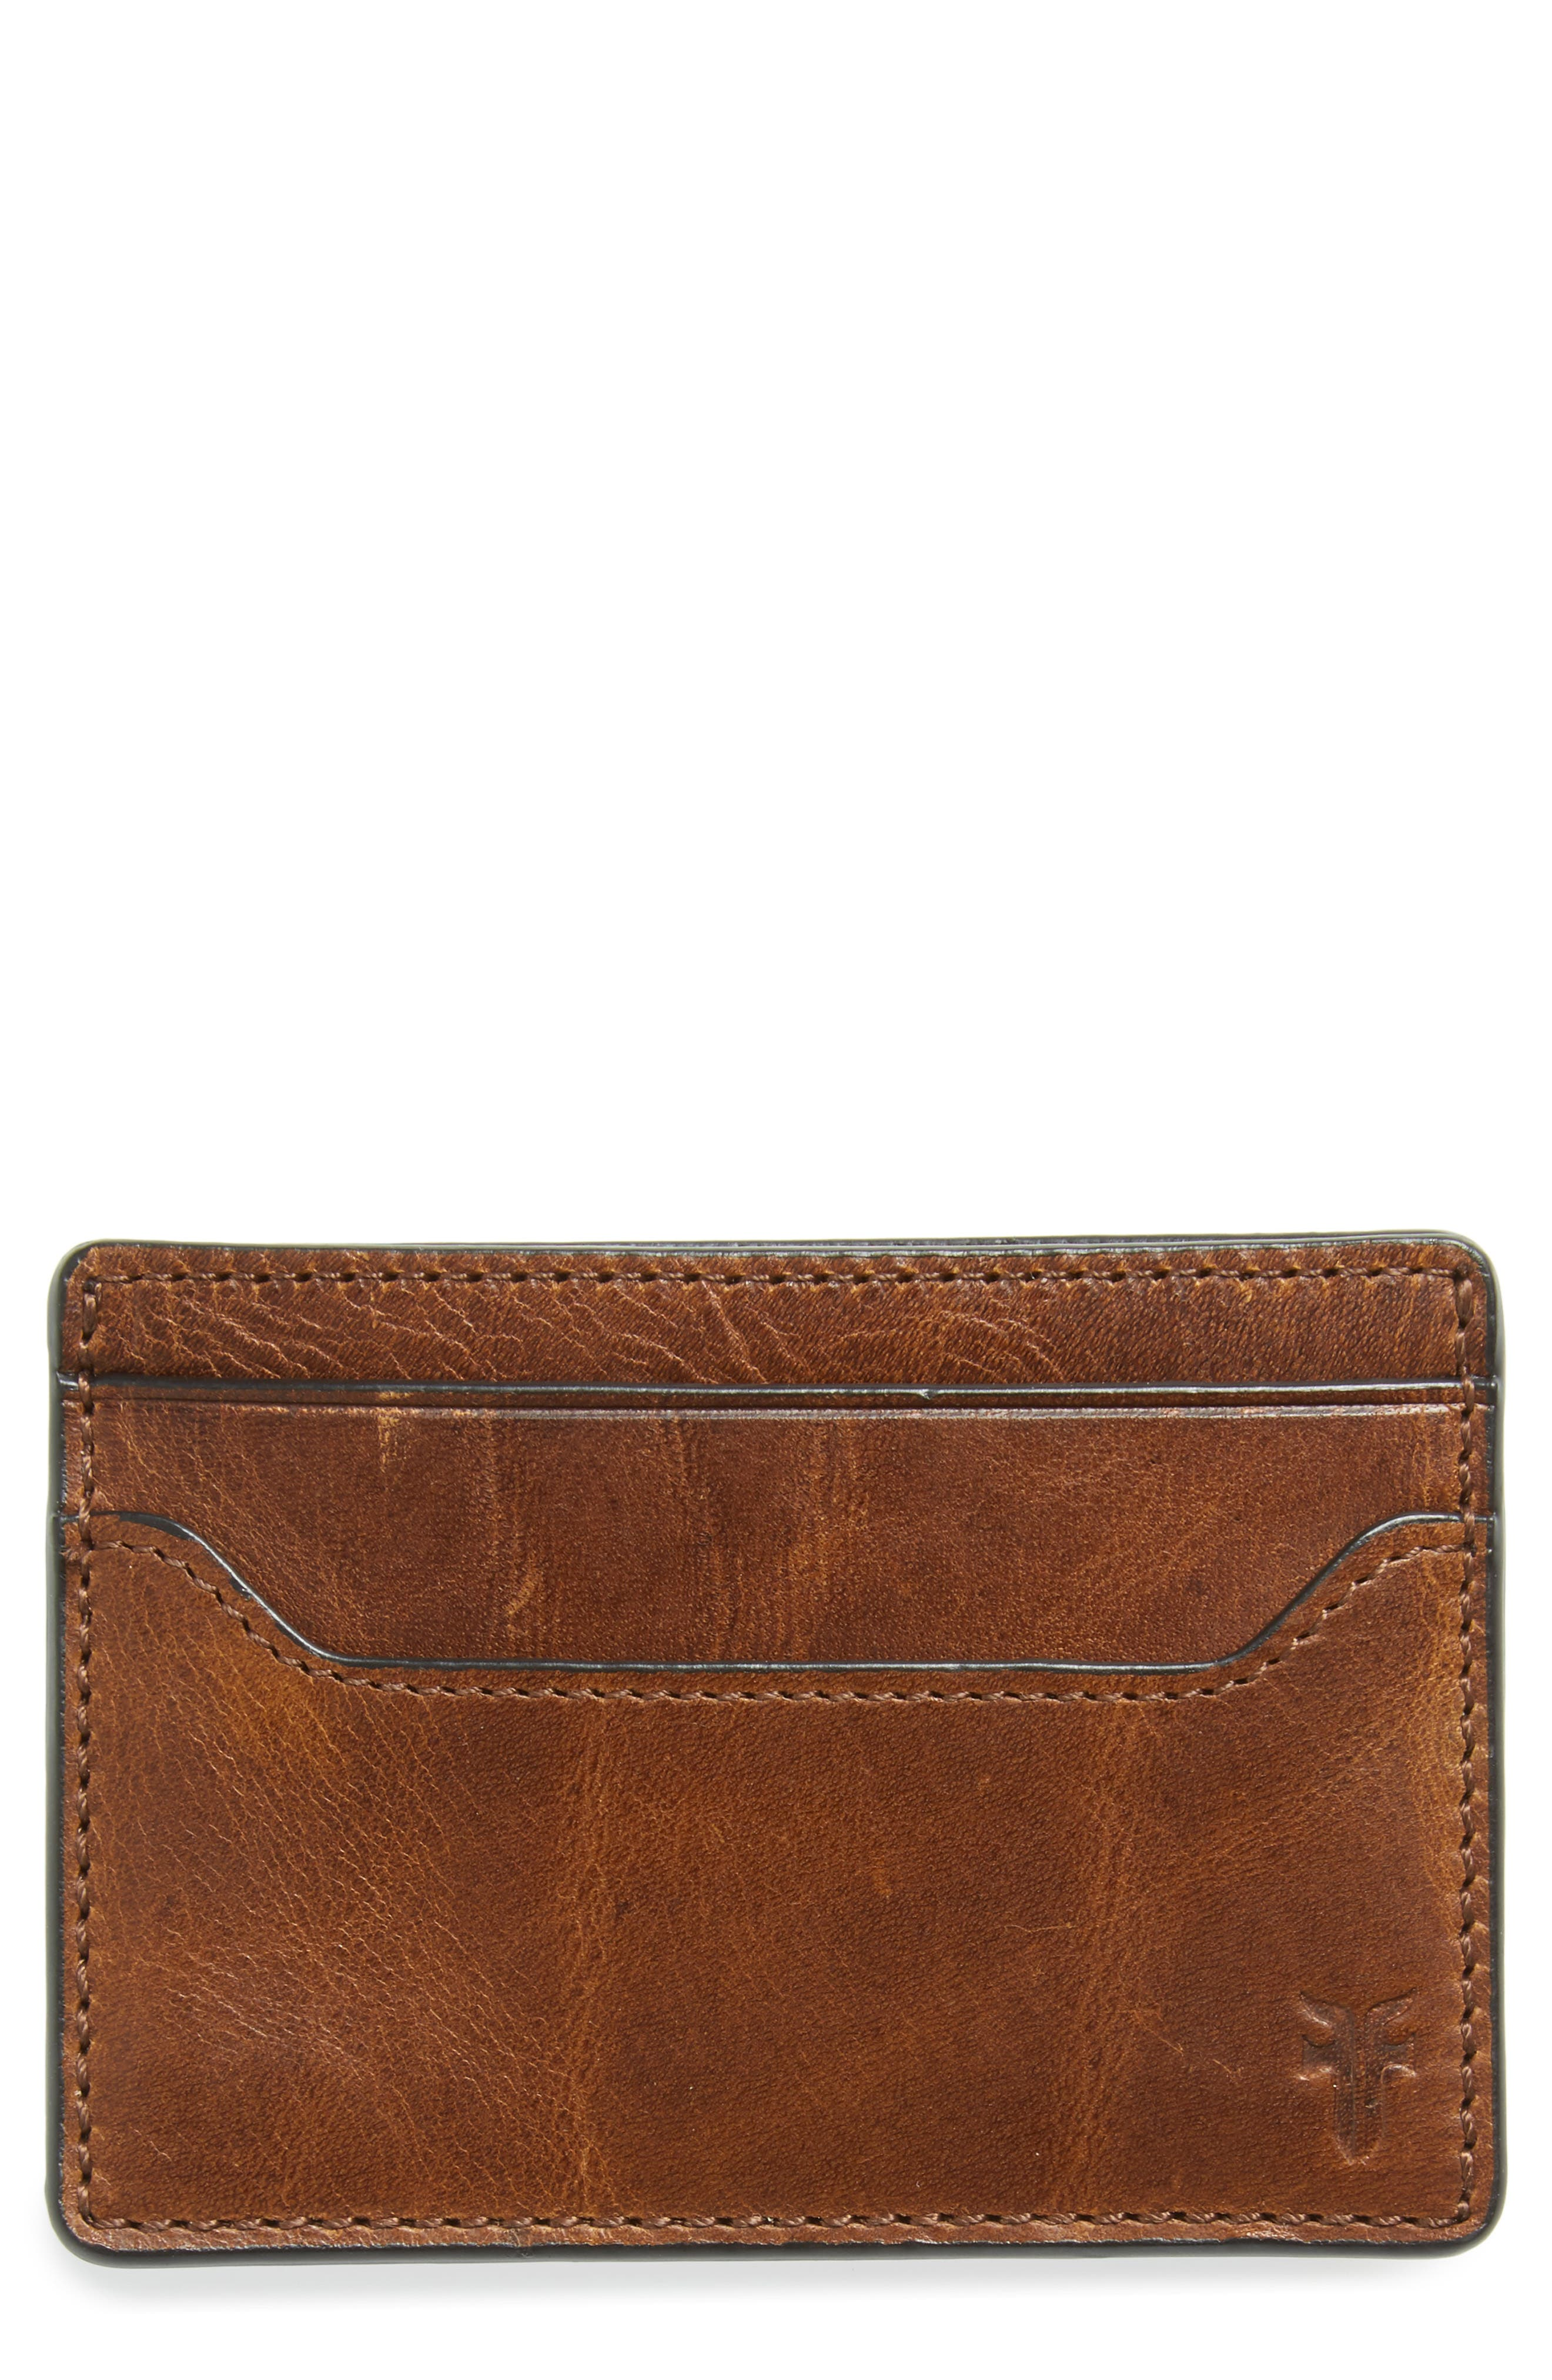 FRYE, Logan Leather Money Clip Card Case, Main thumbnail 1, color, DARK BROWN